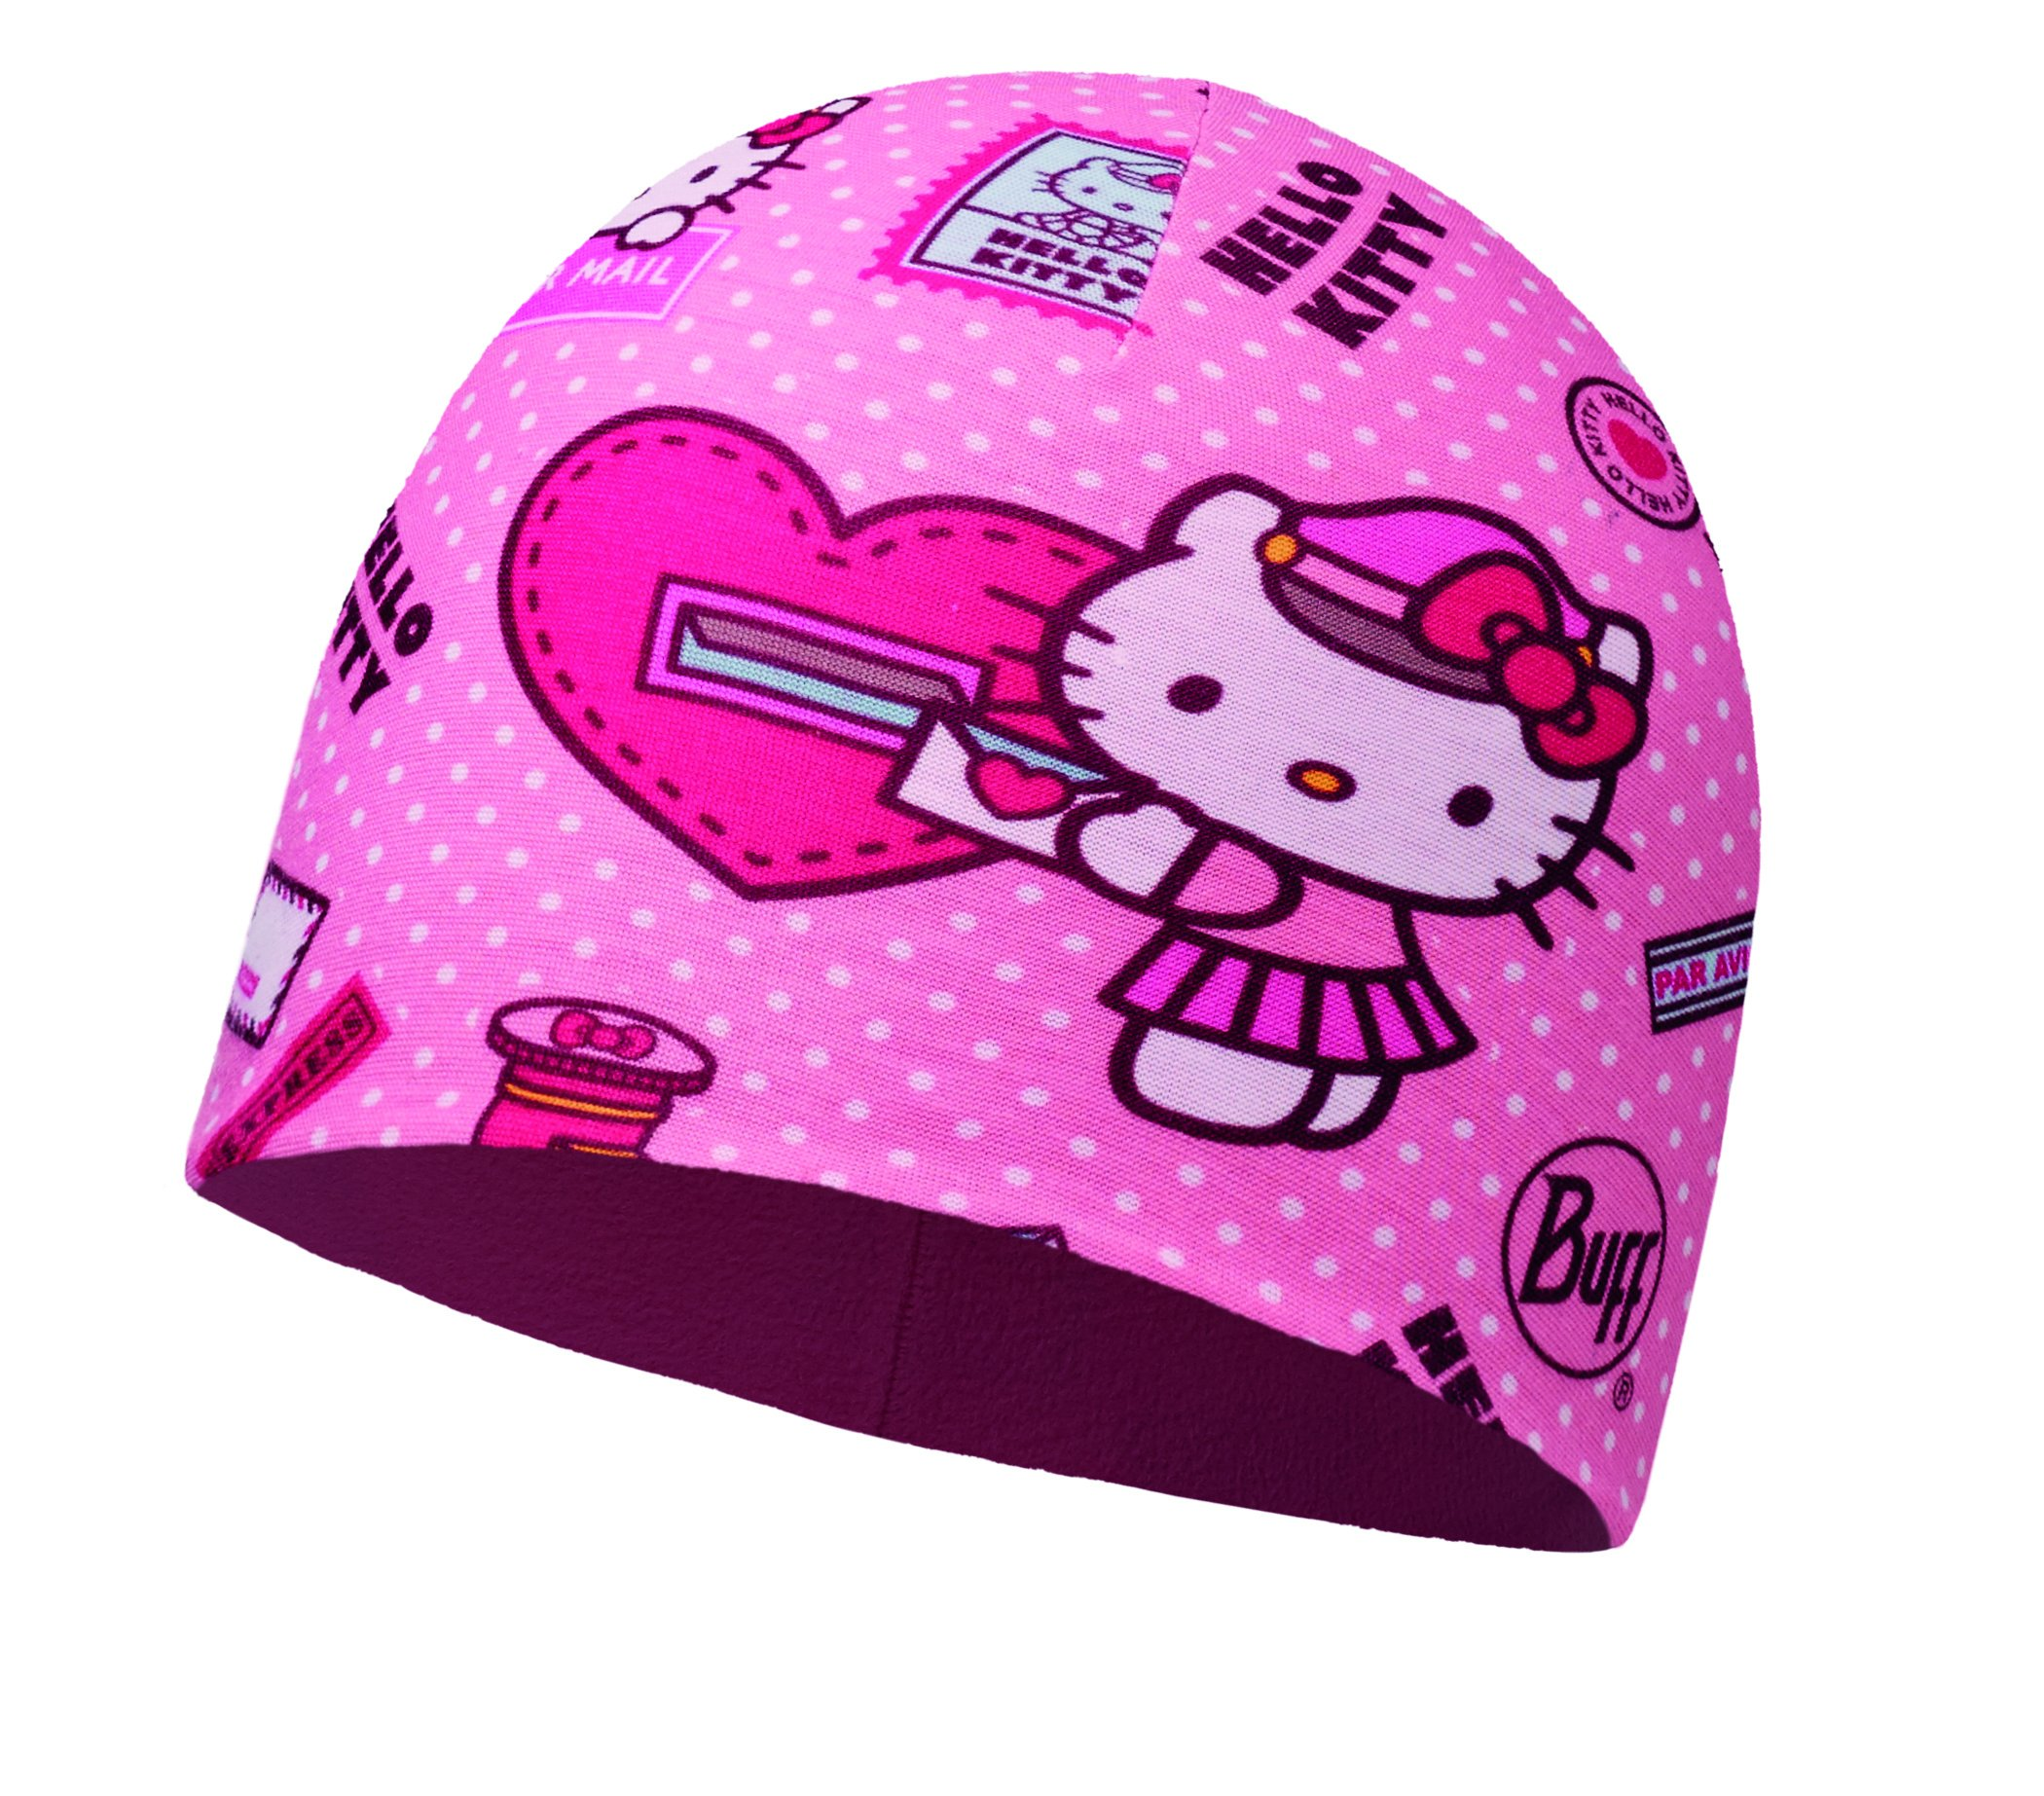 Buff Kinder Hello Kitty Child Microfiber Polar Hat Mütze, Mailing Rosé, One si